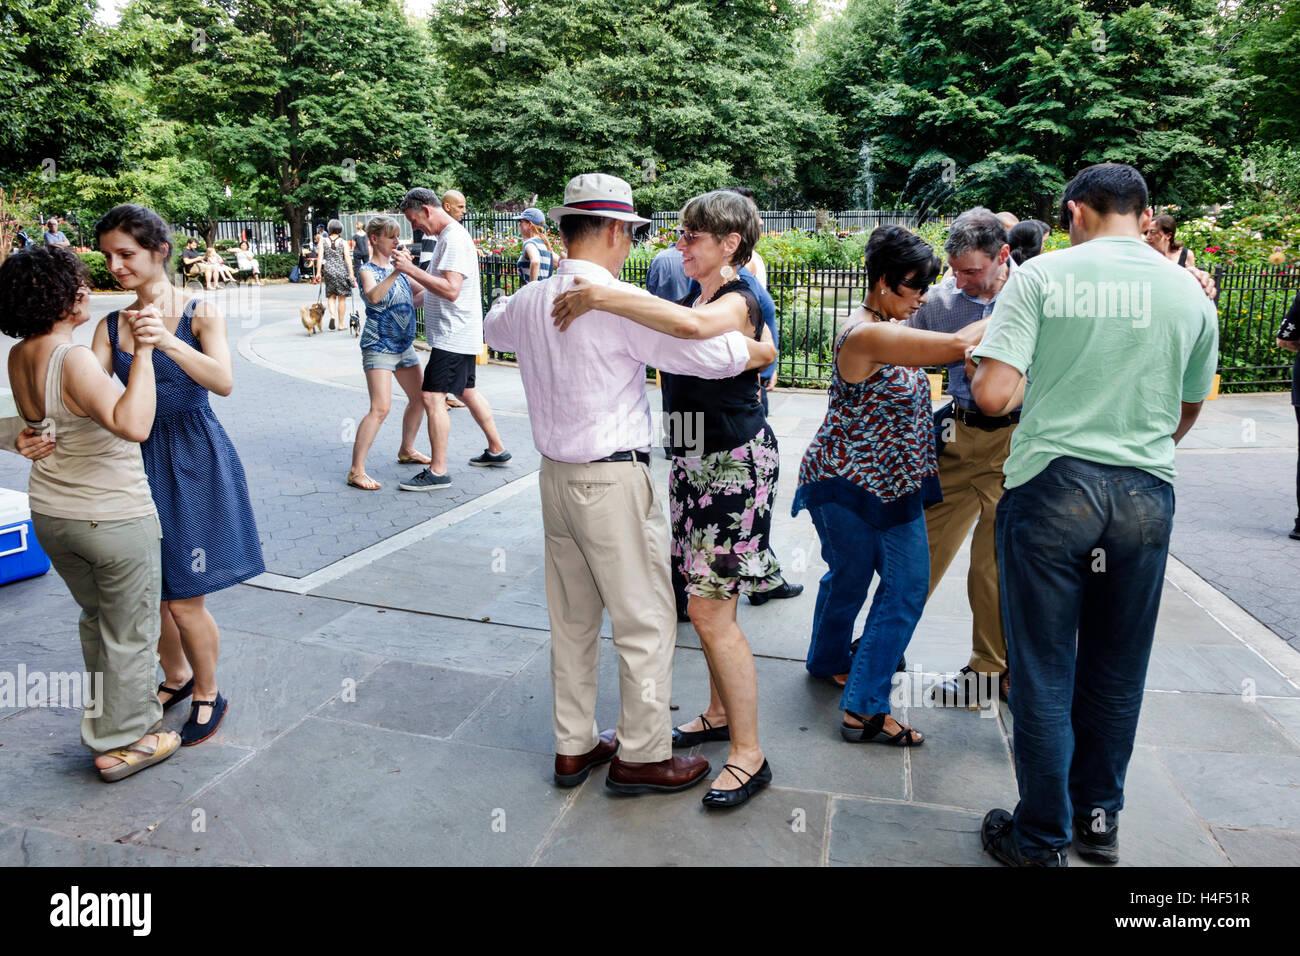 Manhattan New York City NYC NY Stuyvesant Square public park central fountain Tango Sundays with Esmeralda Argentine - Stock Image